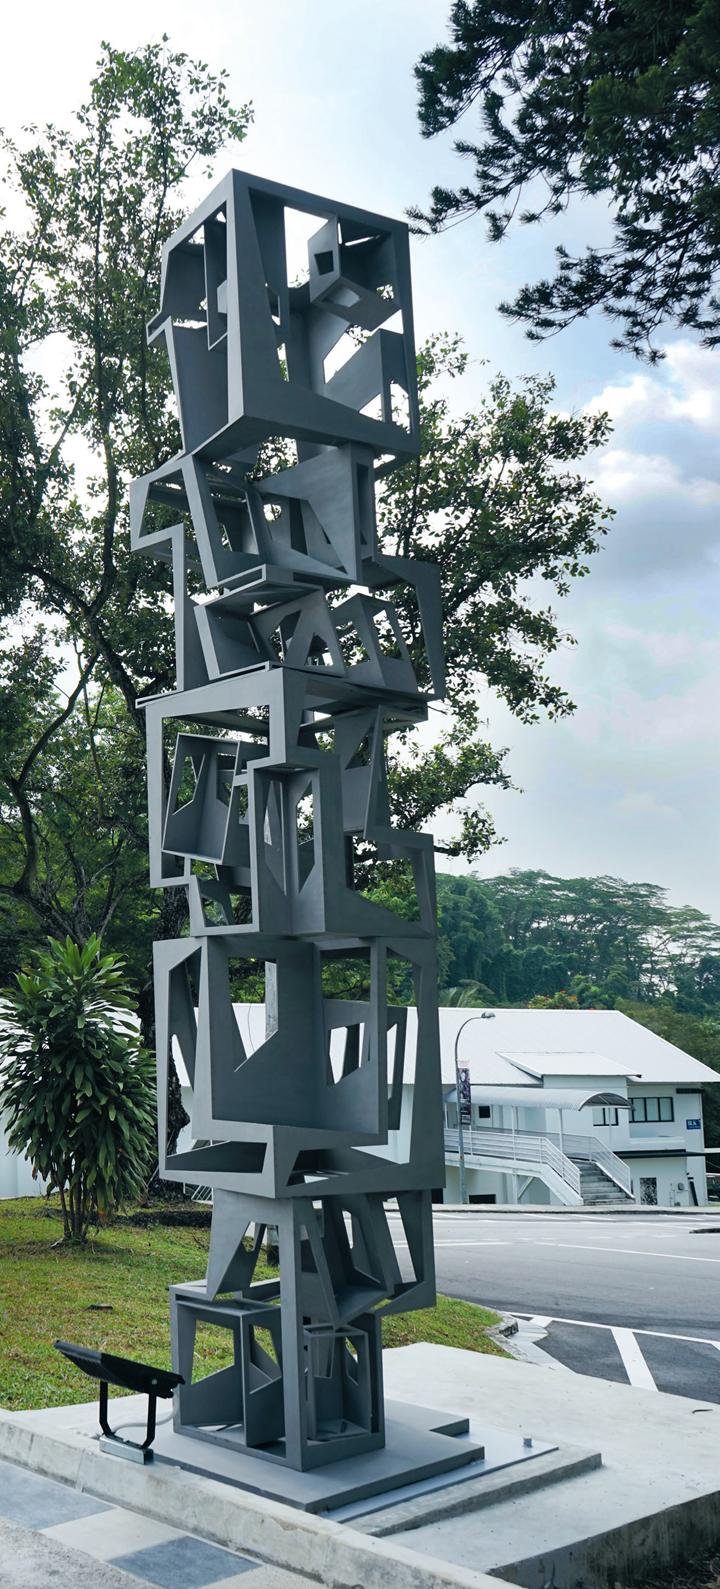 Ding Yi, Pillar (2014). Stainless steel. Edition of 3. Installation view: Gillman Barracks, Singapore. Courtesy ShanghART Gallery, Shanghai/ Beijing/ Singapore.